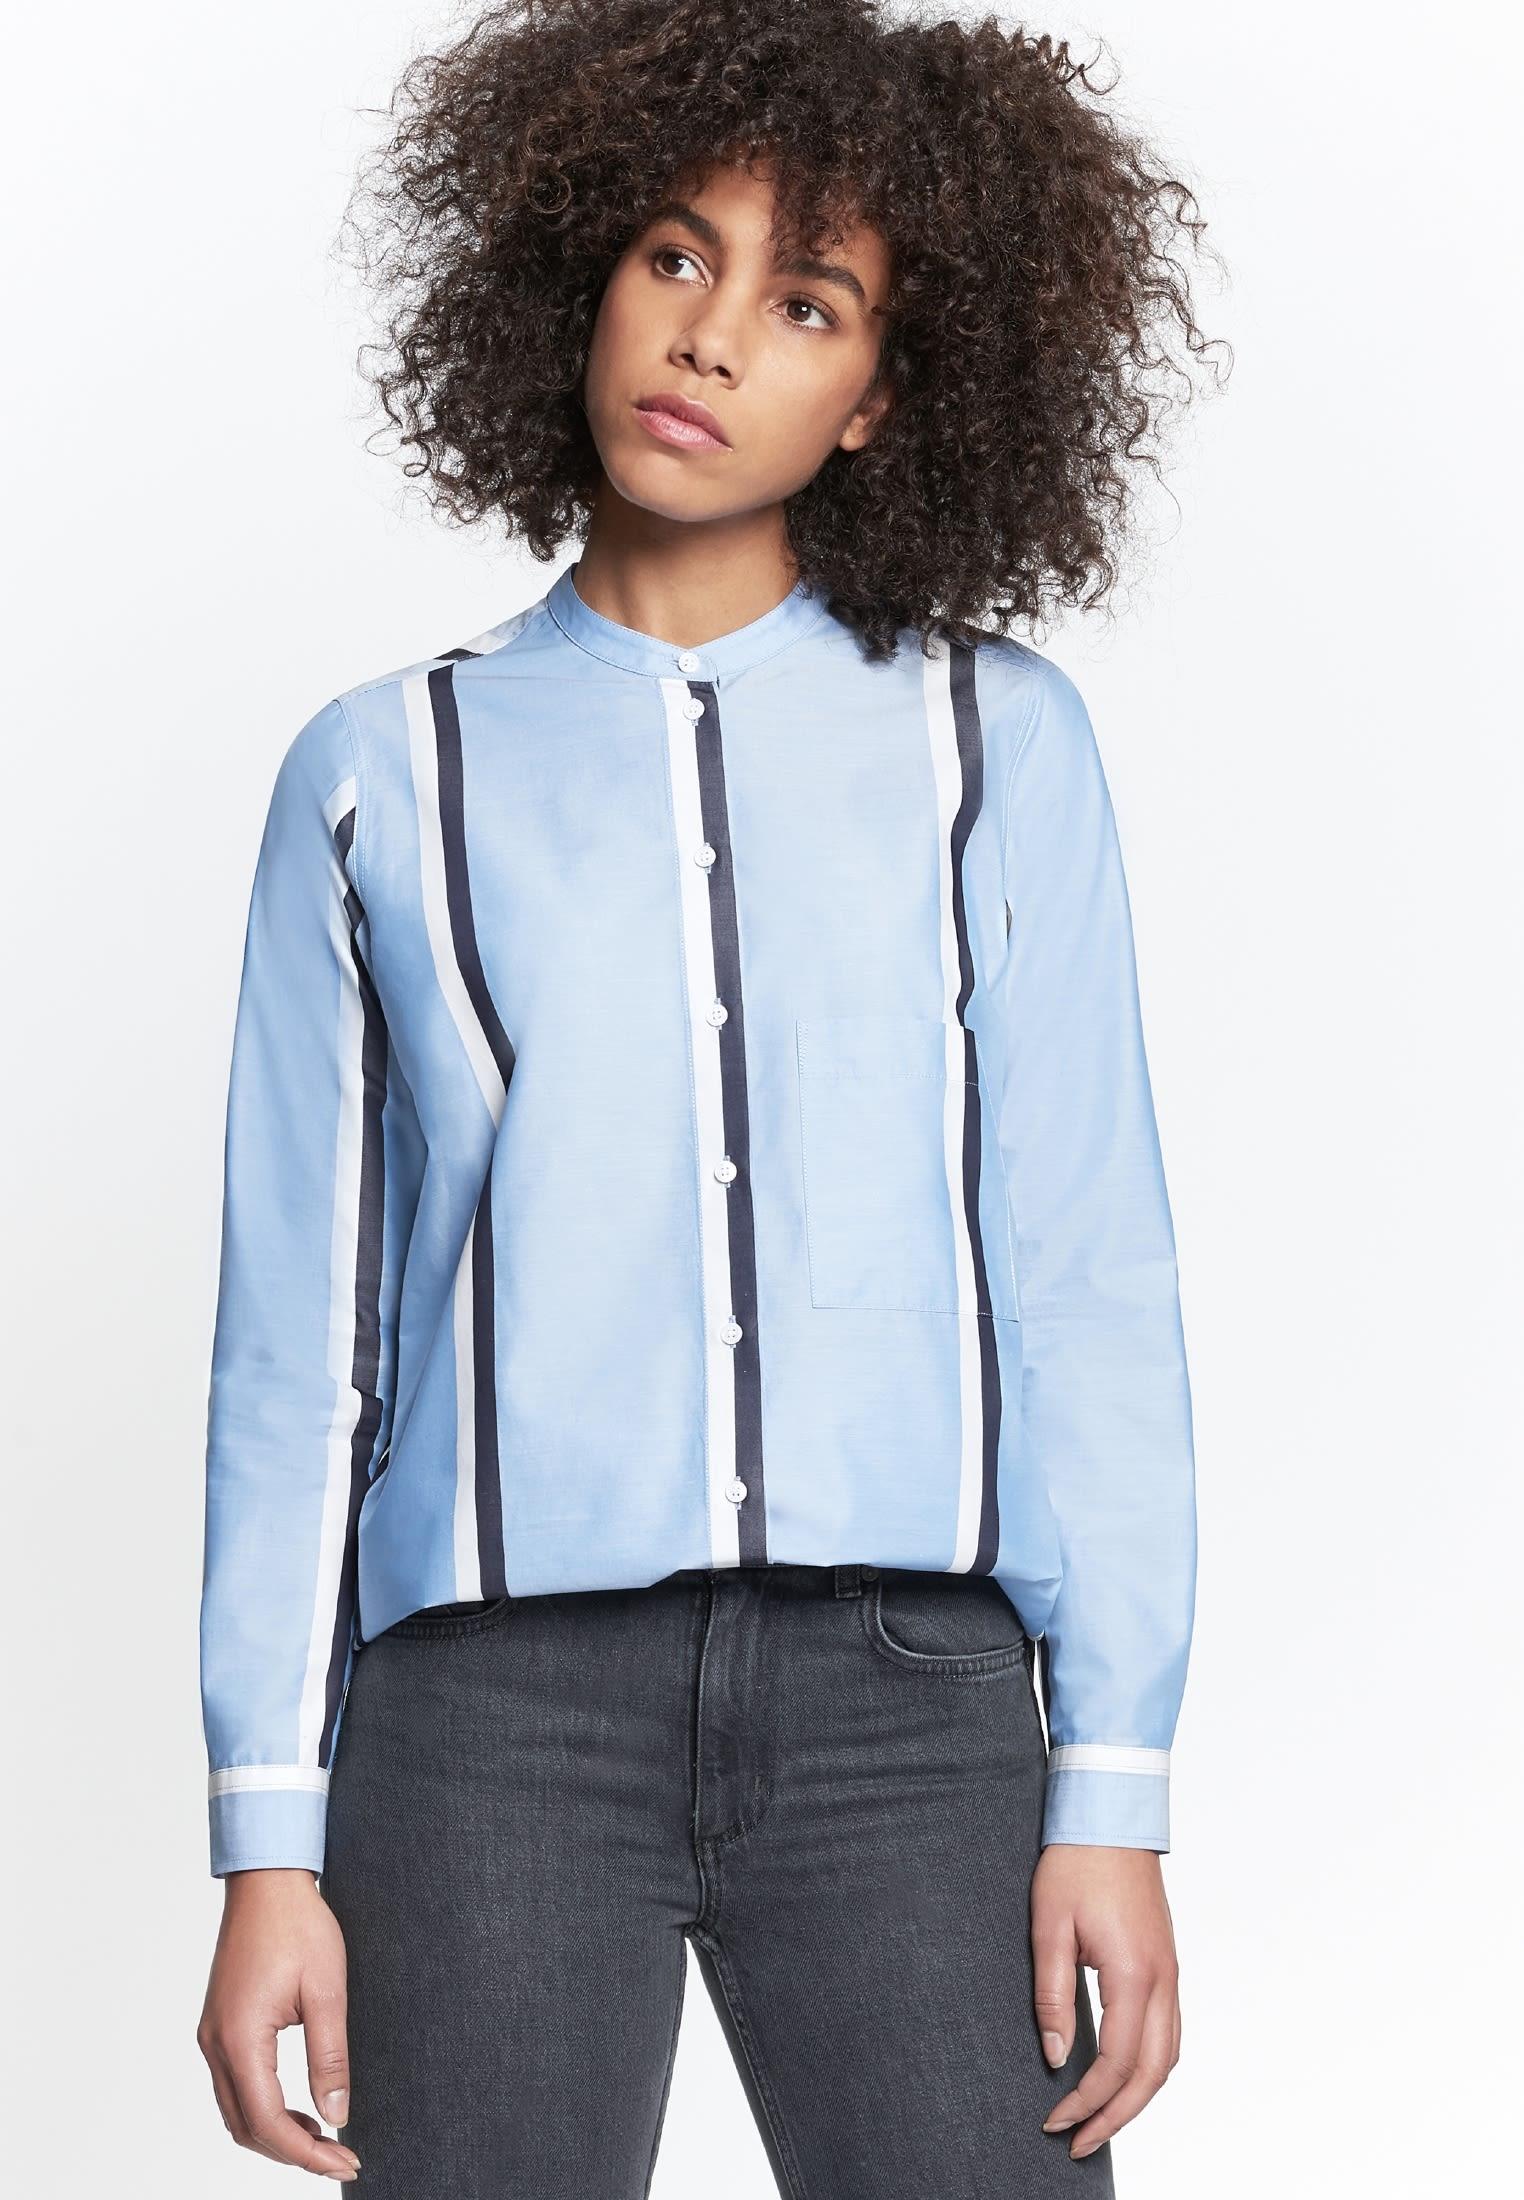 Structure Stand-Up Blouse made of 100% Cotton in blau |  Seidensticker Onlineshop